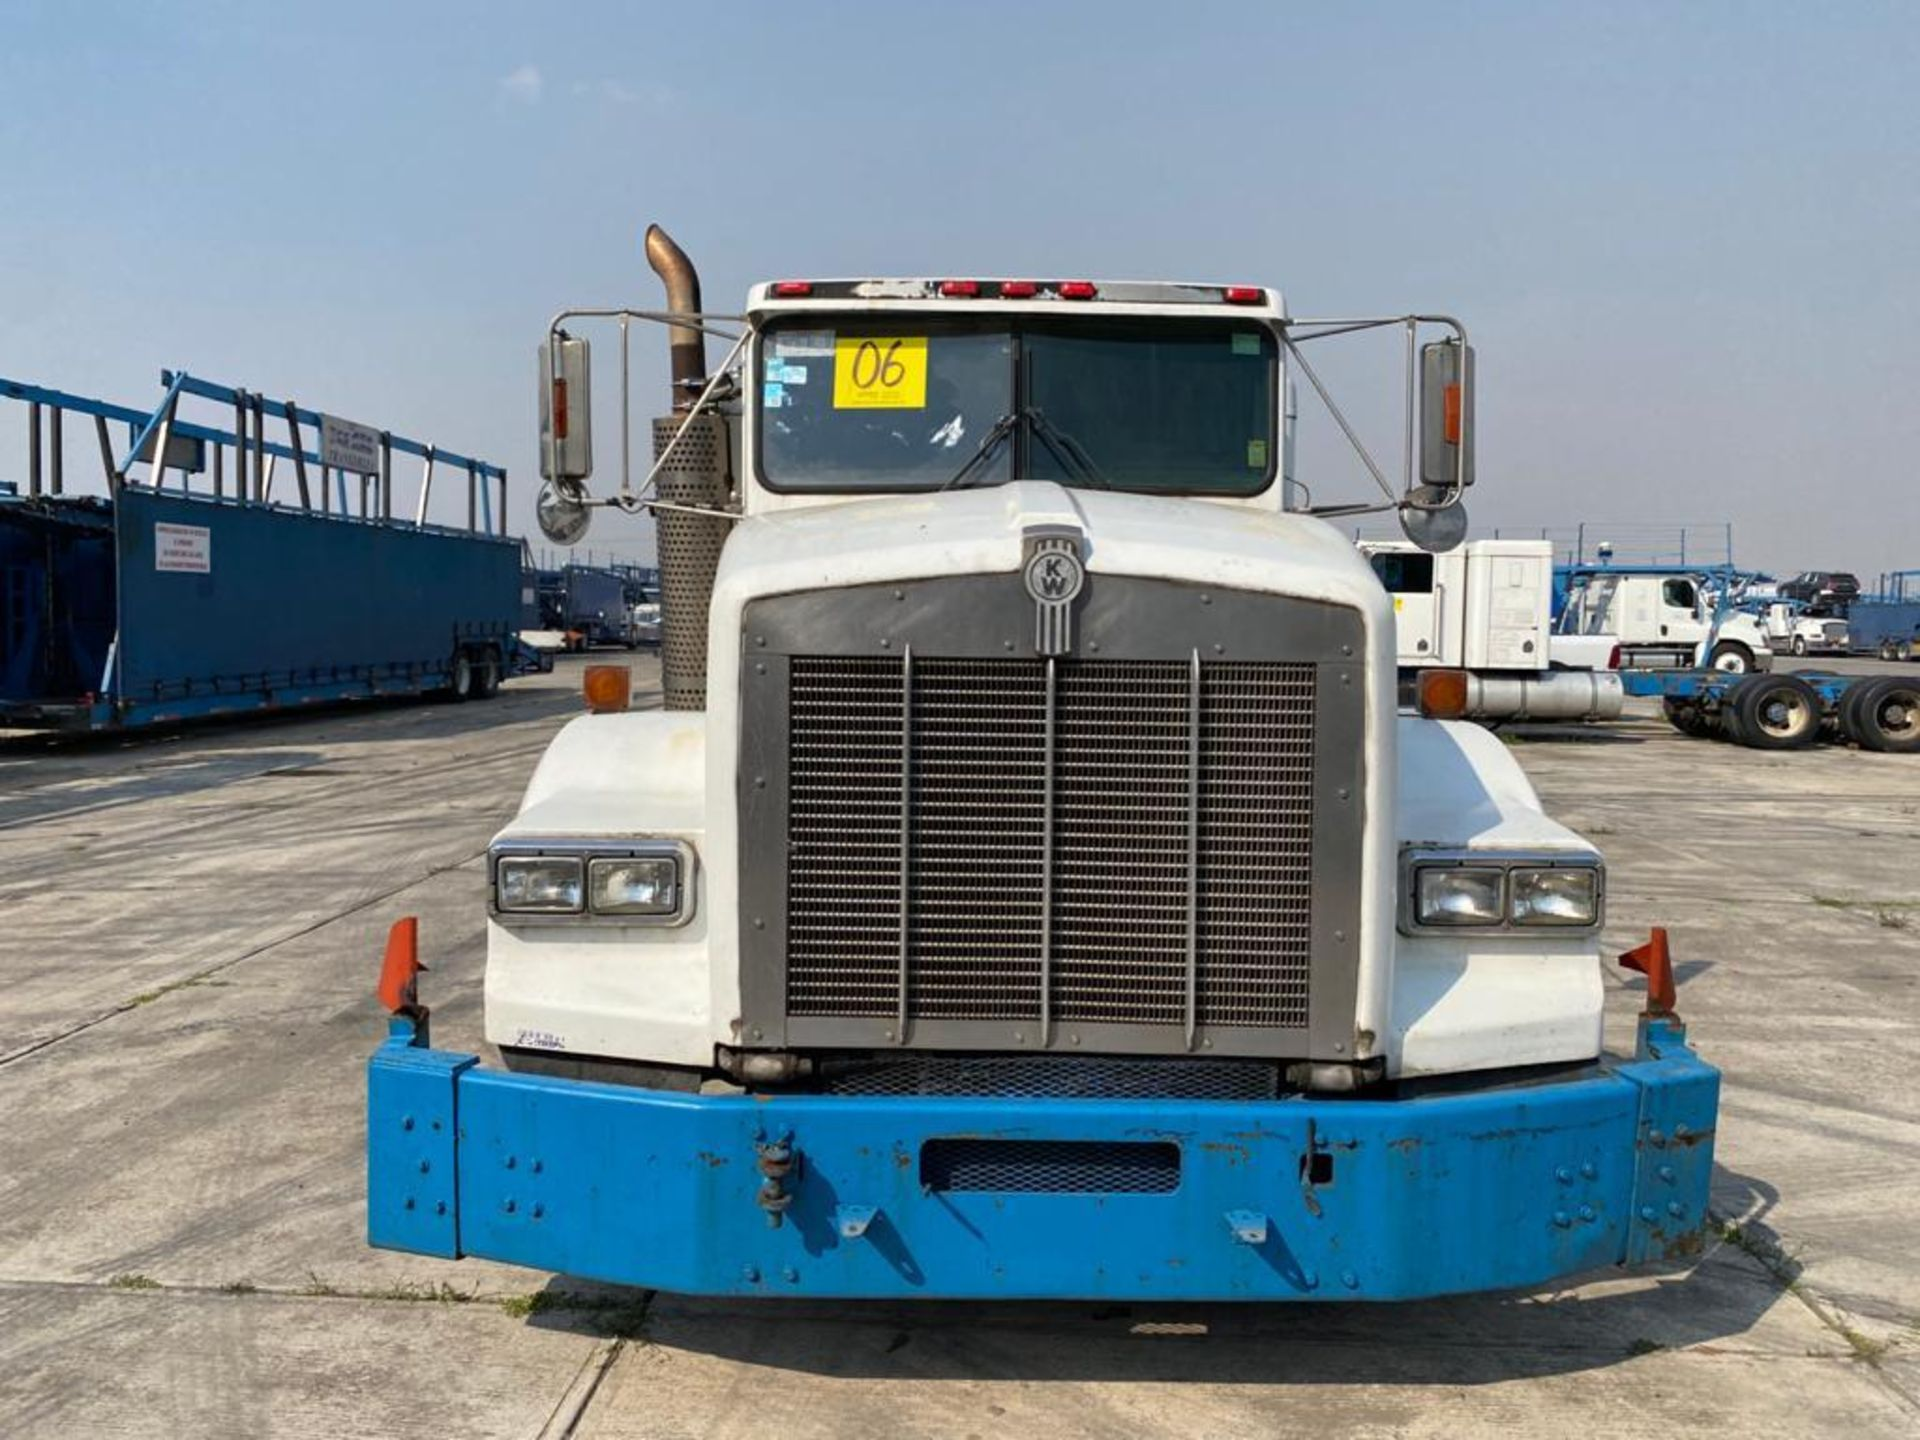 1998 Kenworth Sleeper truck tractor, standard transmission of 18 speeds - Image 4 of 75